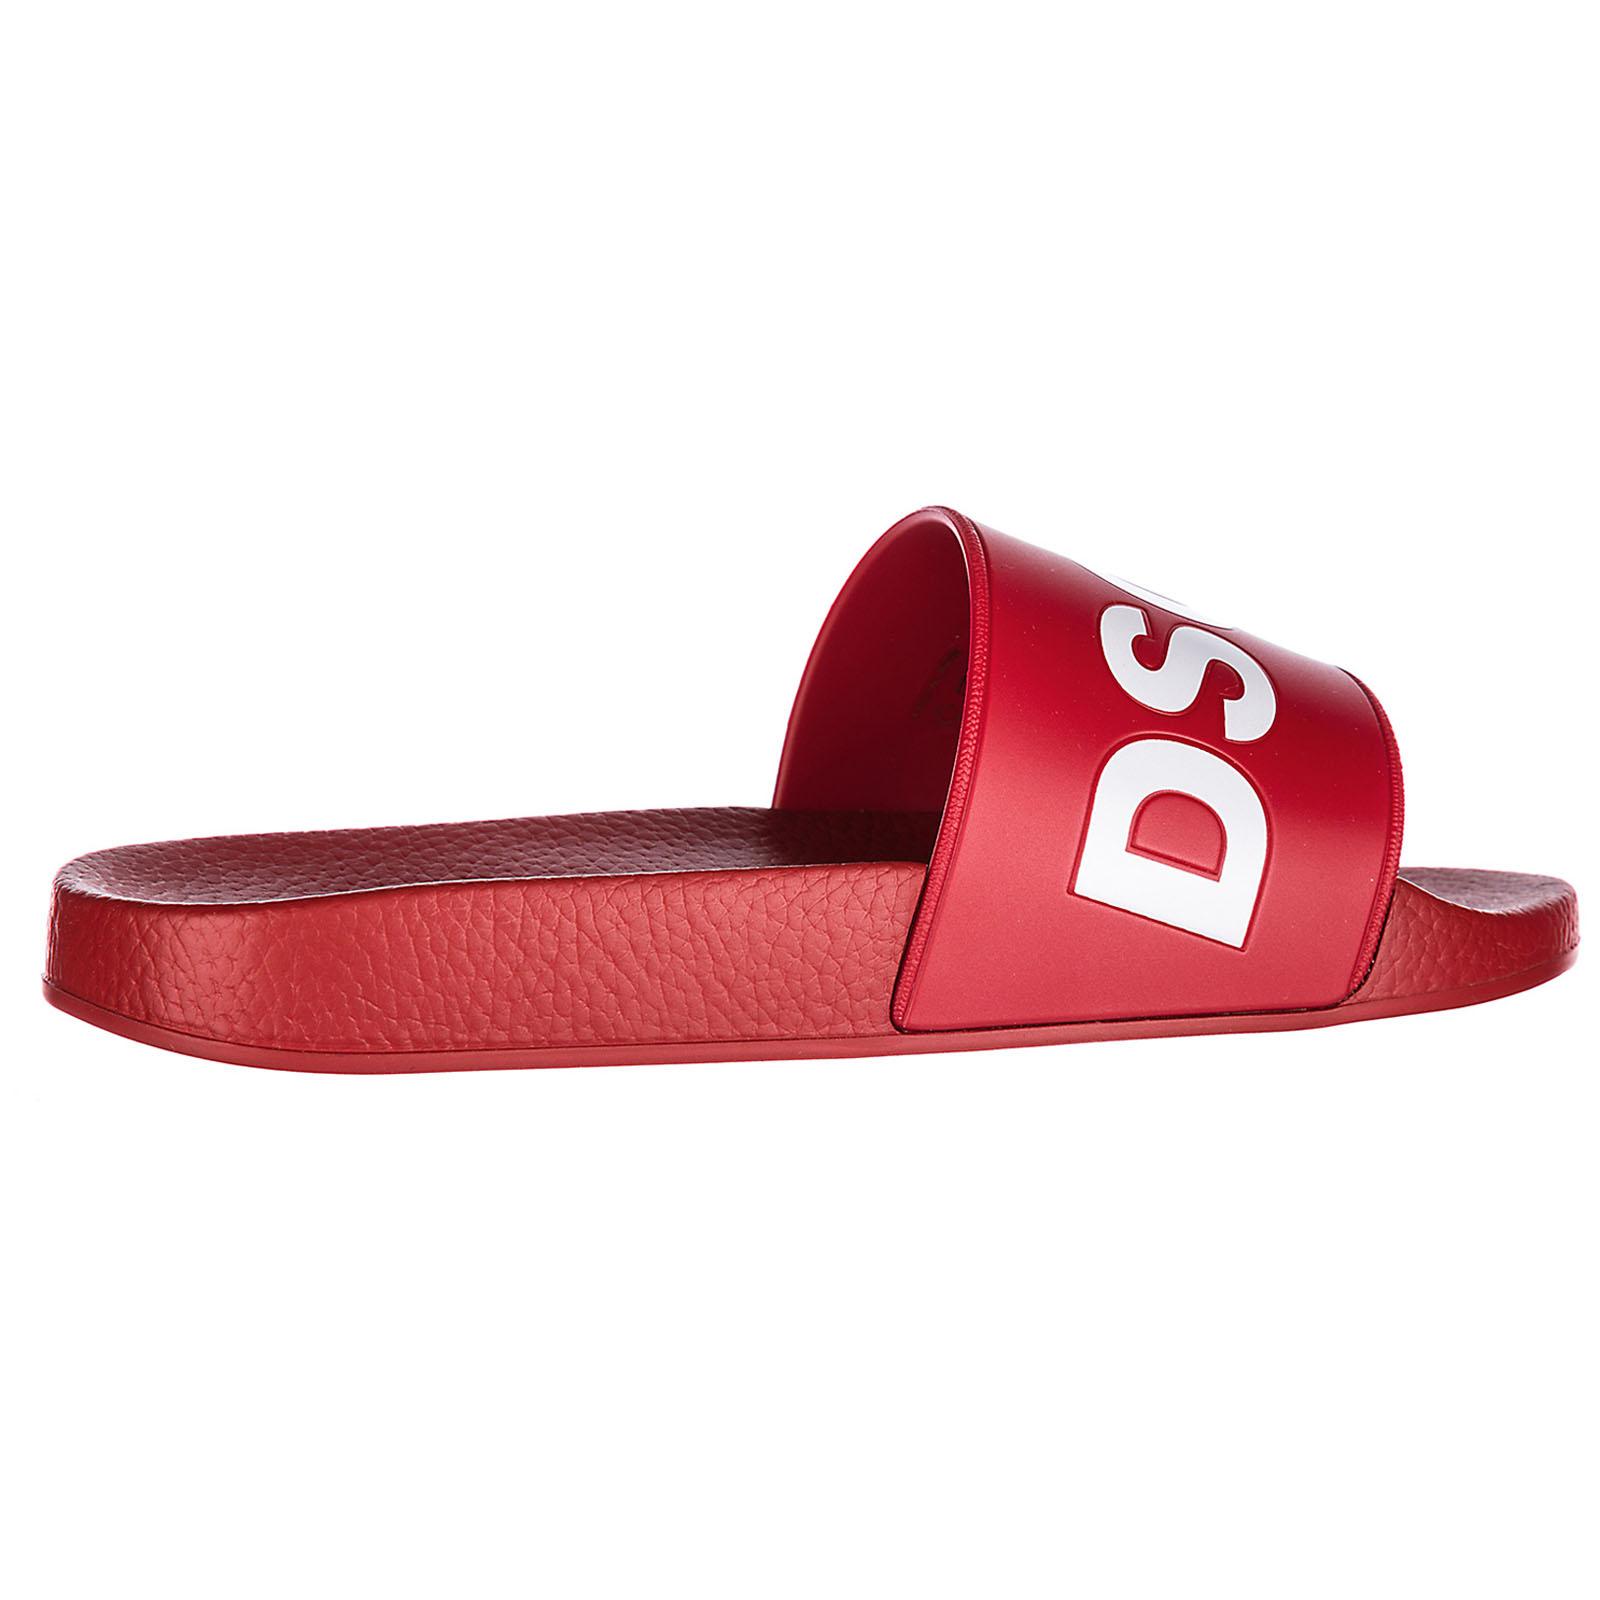 Men's slippers sandals rubber